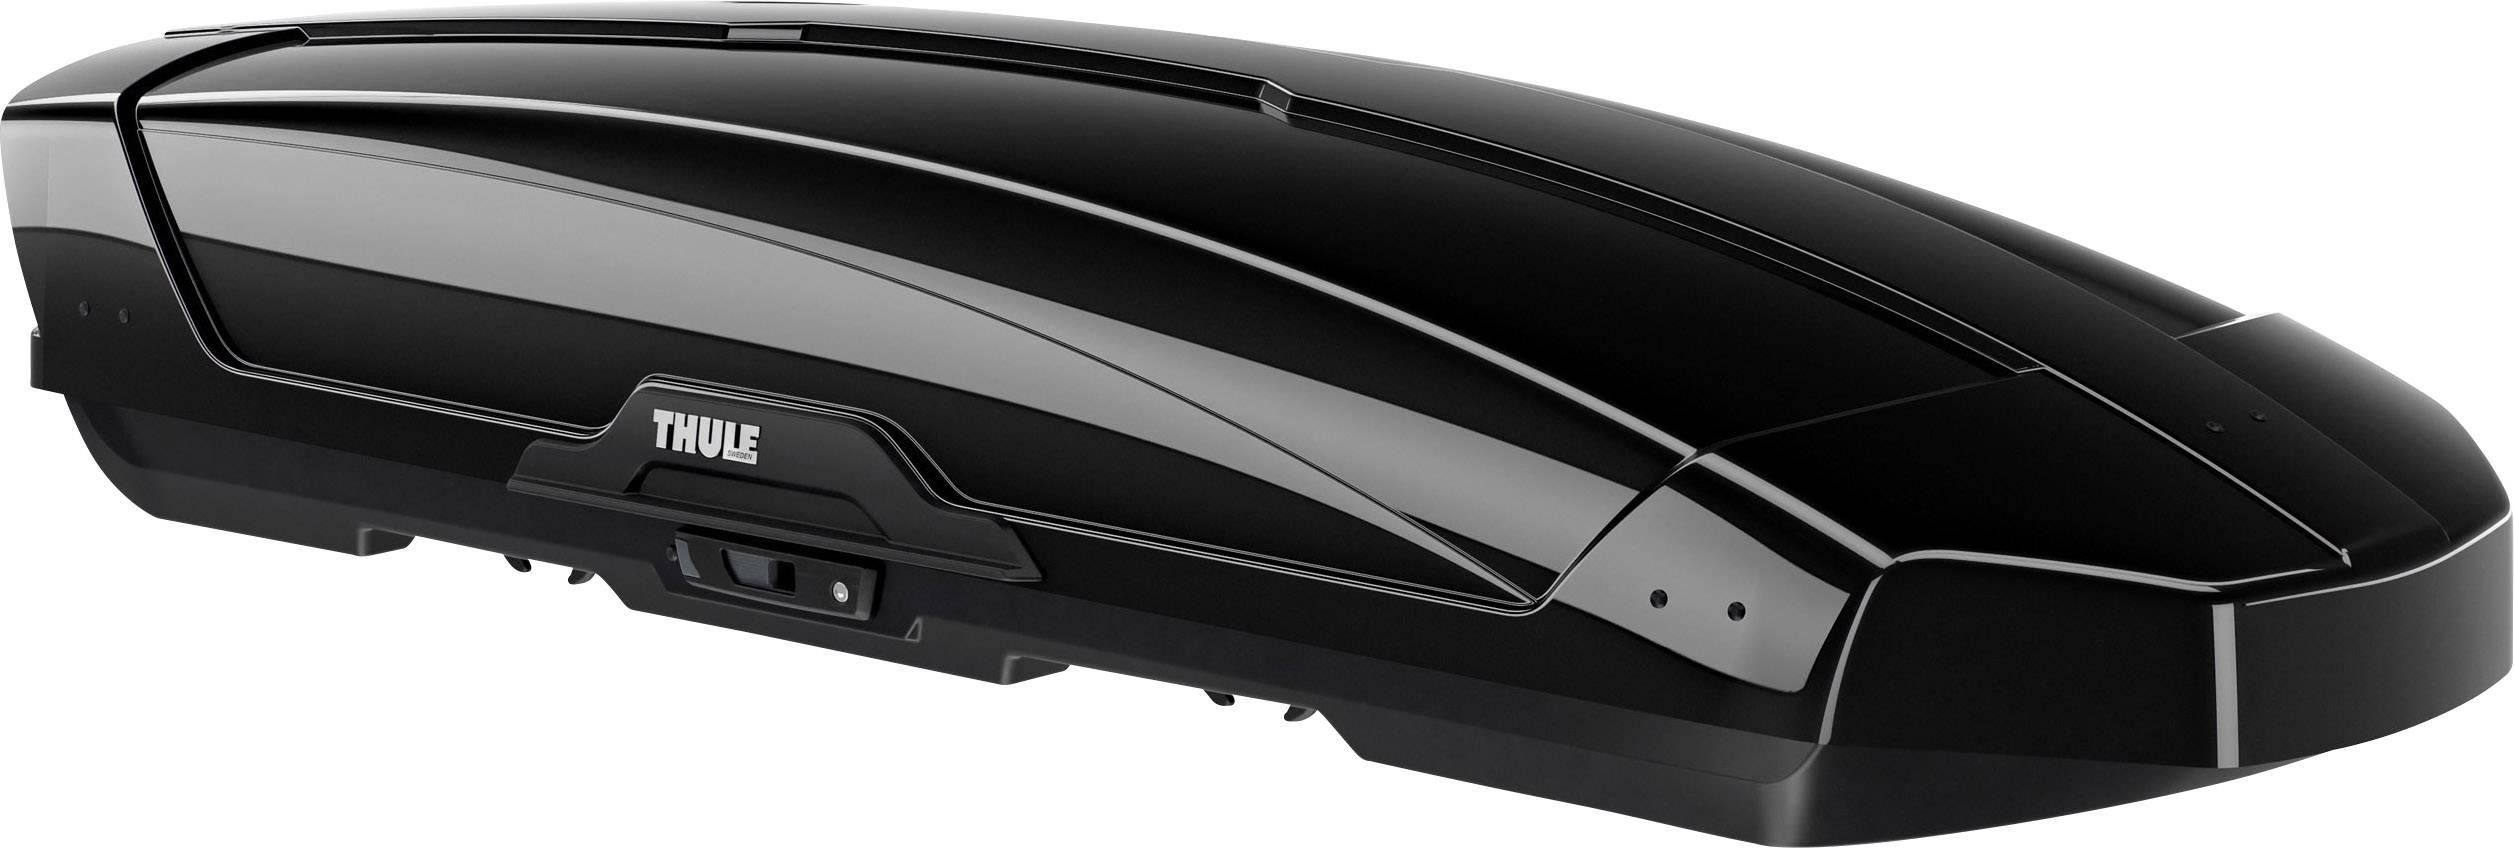 Thule Car roof box 610 l Motion XT XXL Black | Conrad.com